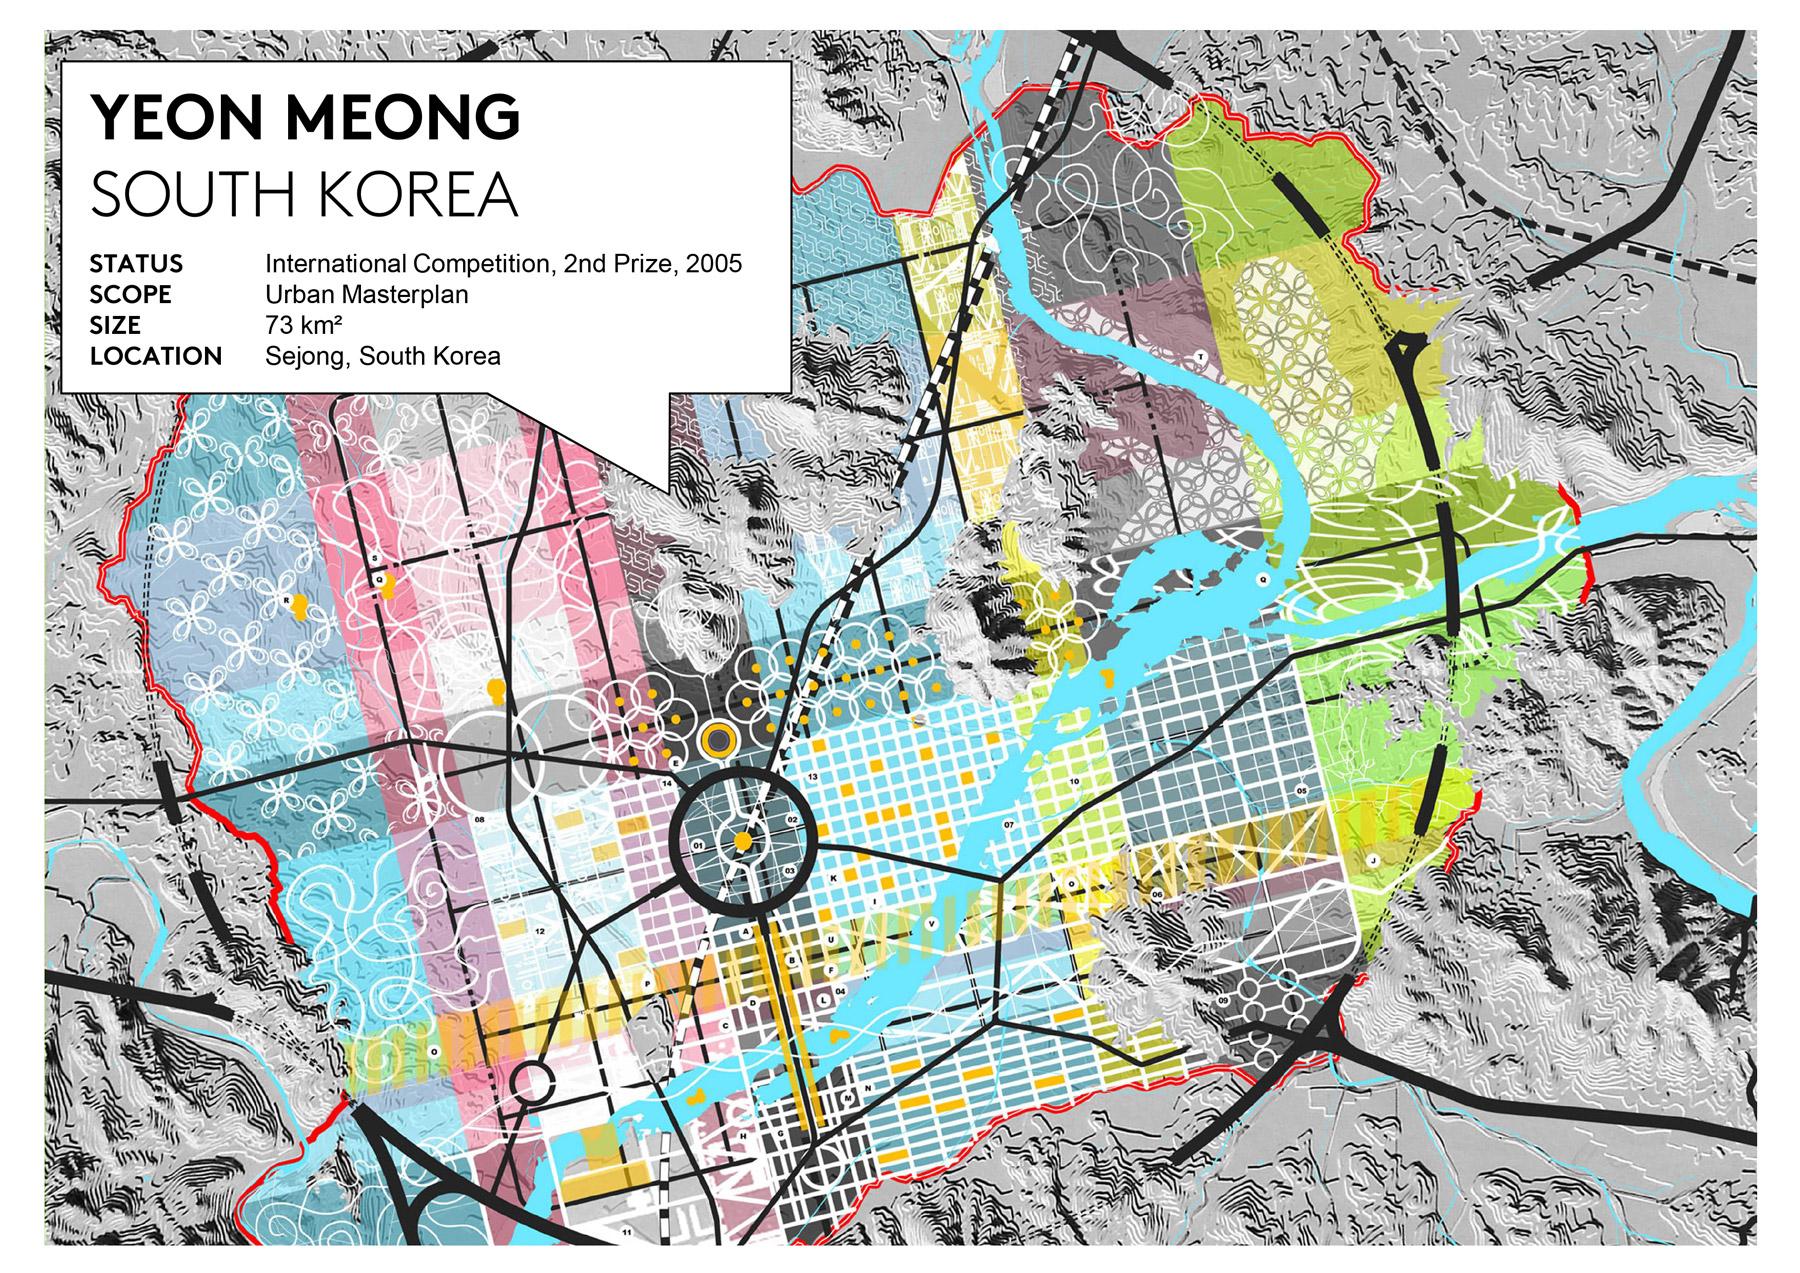 007_Korea_Yeon_Meong_Slide_02